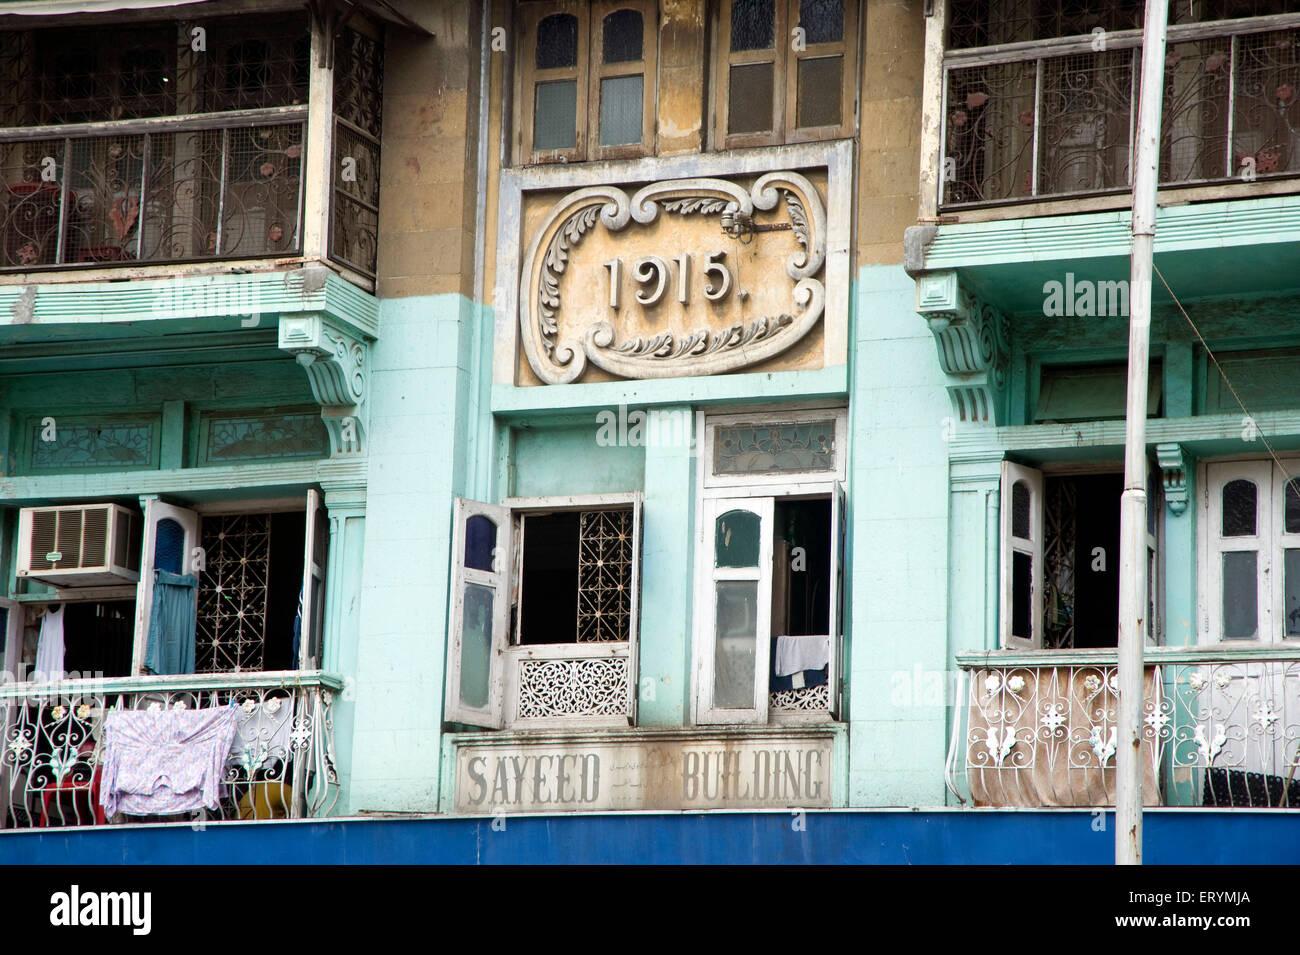 1915  Bombay old Sayeed building Grant road Mumbai Maharashtra India Asia - Stock Image